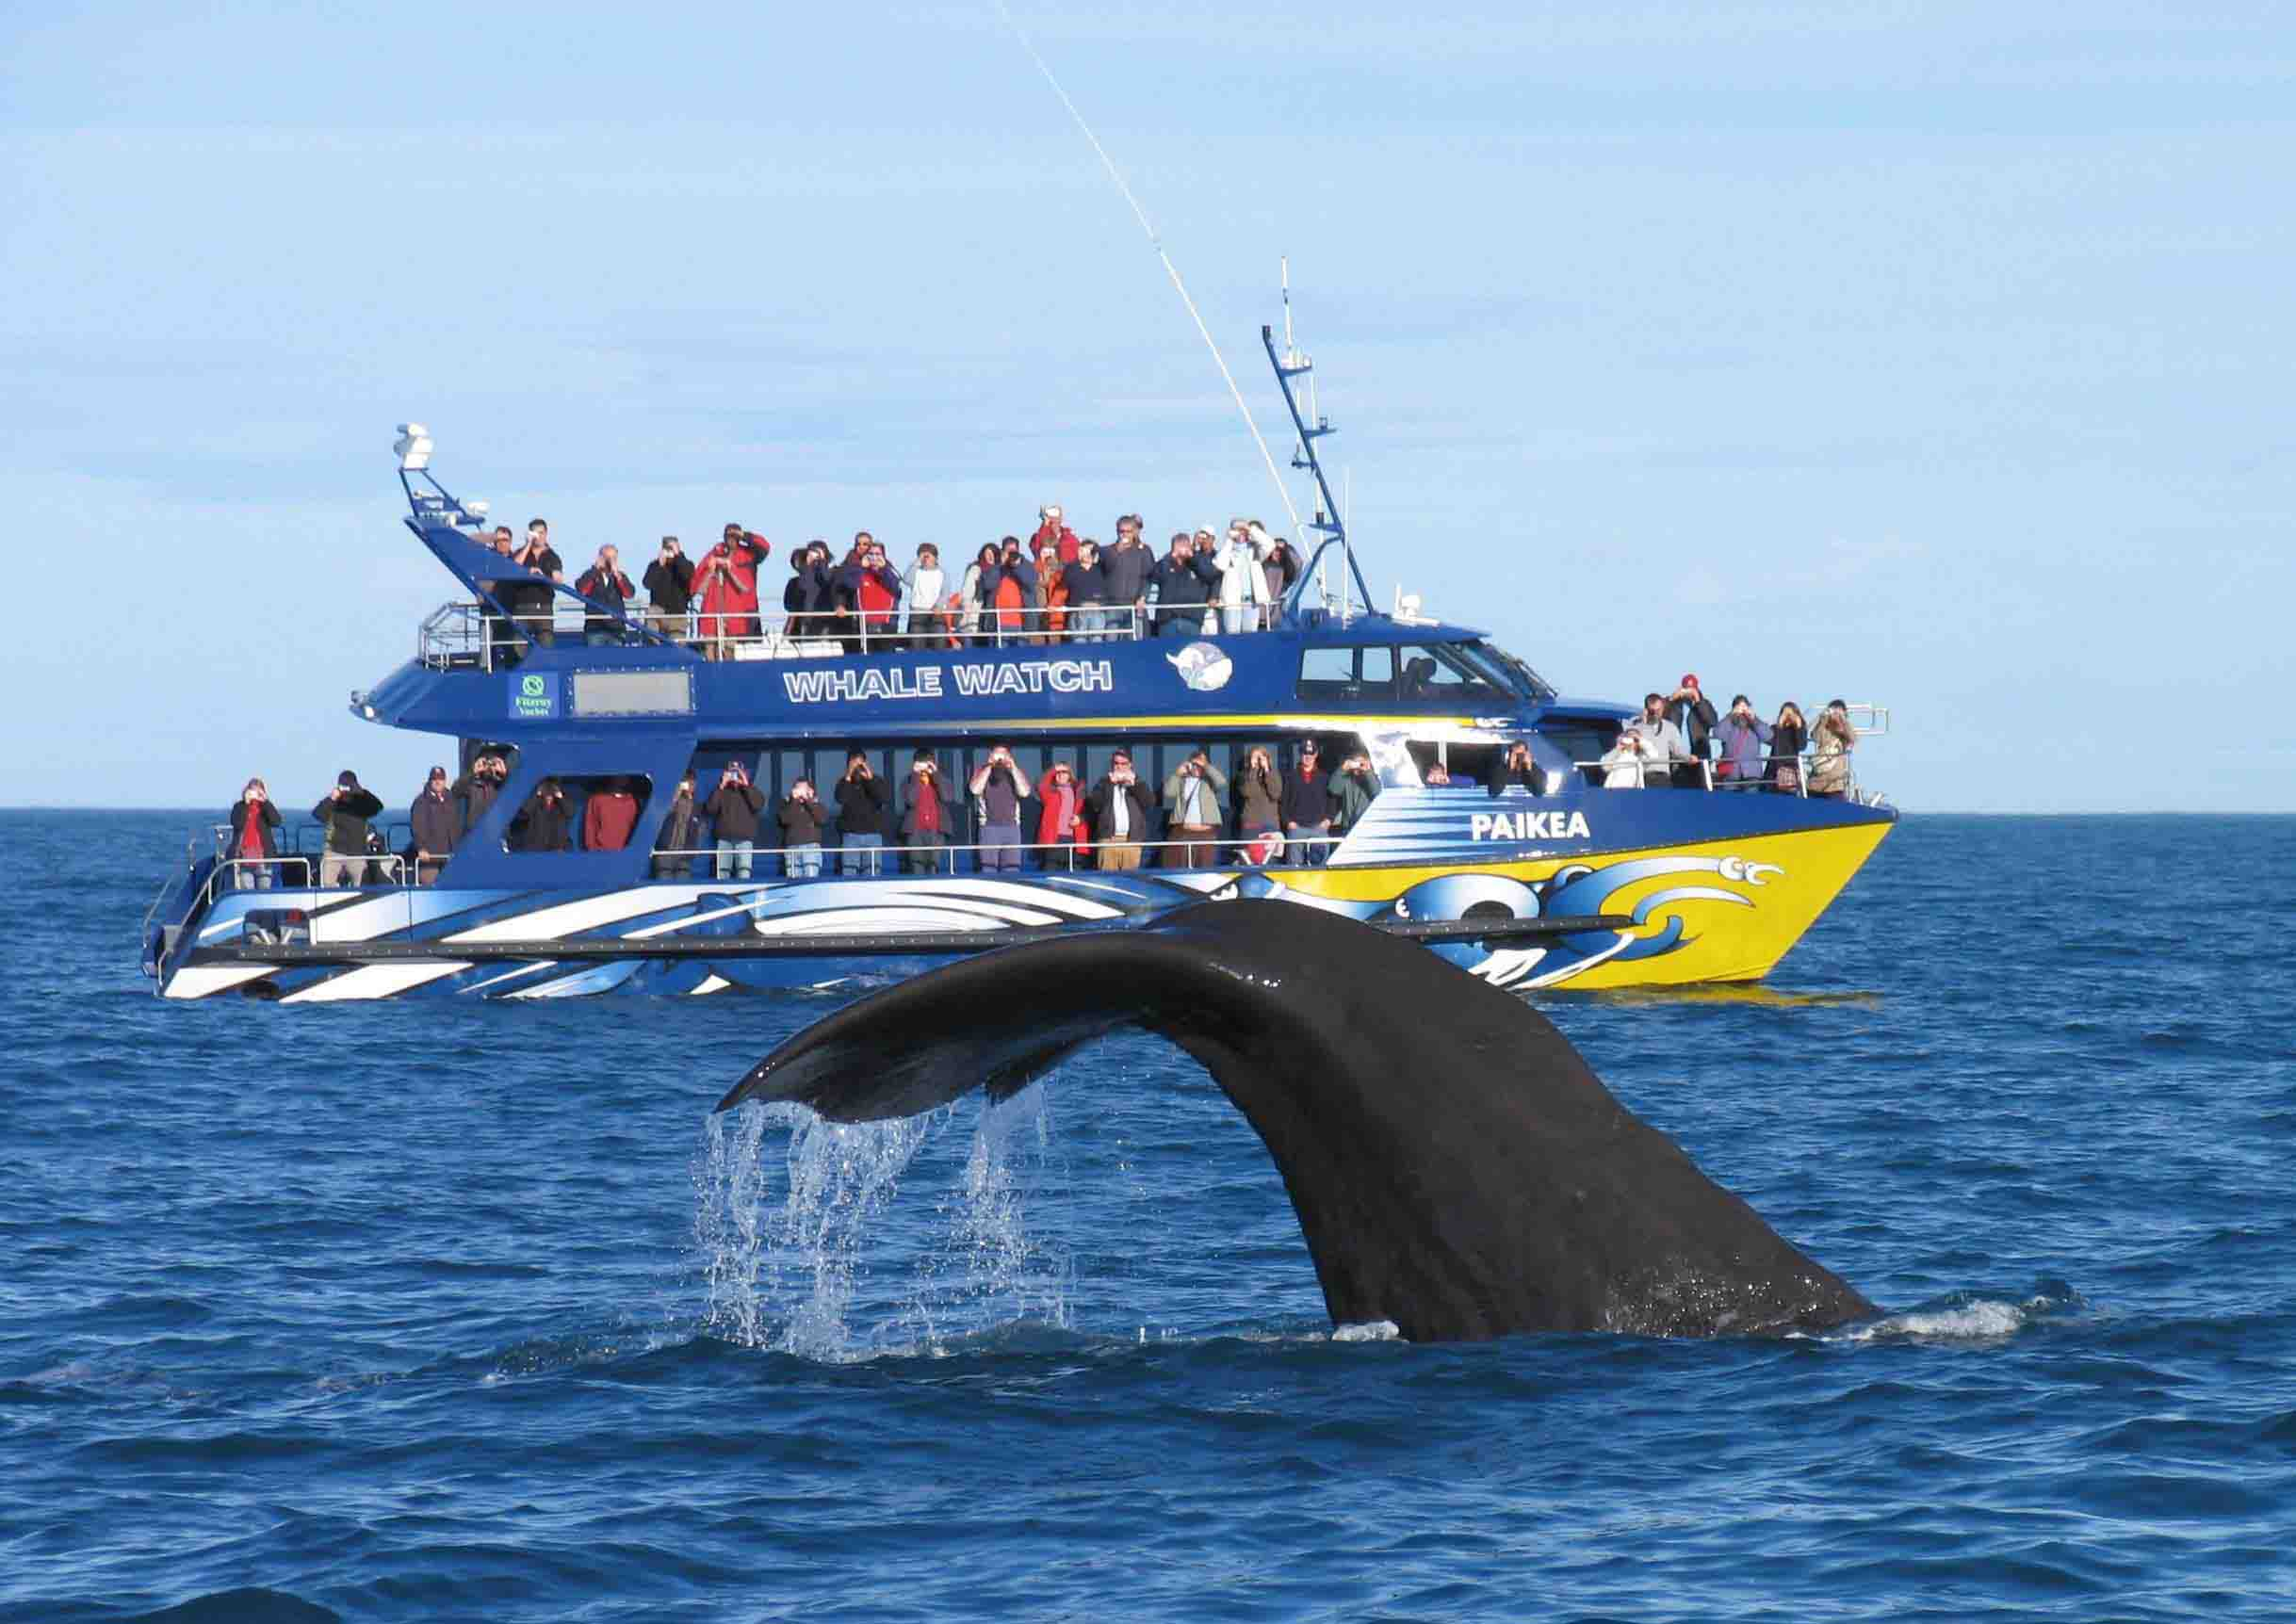 Whales & Dolphin in Mirissa or Kalpitiya Sri Lanka